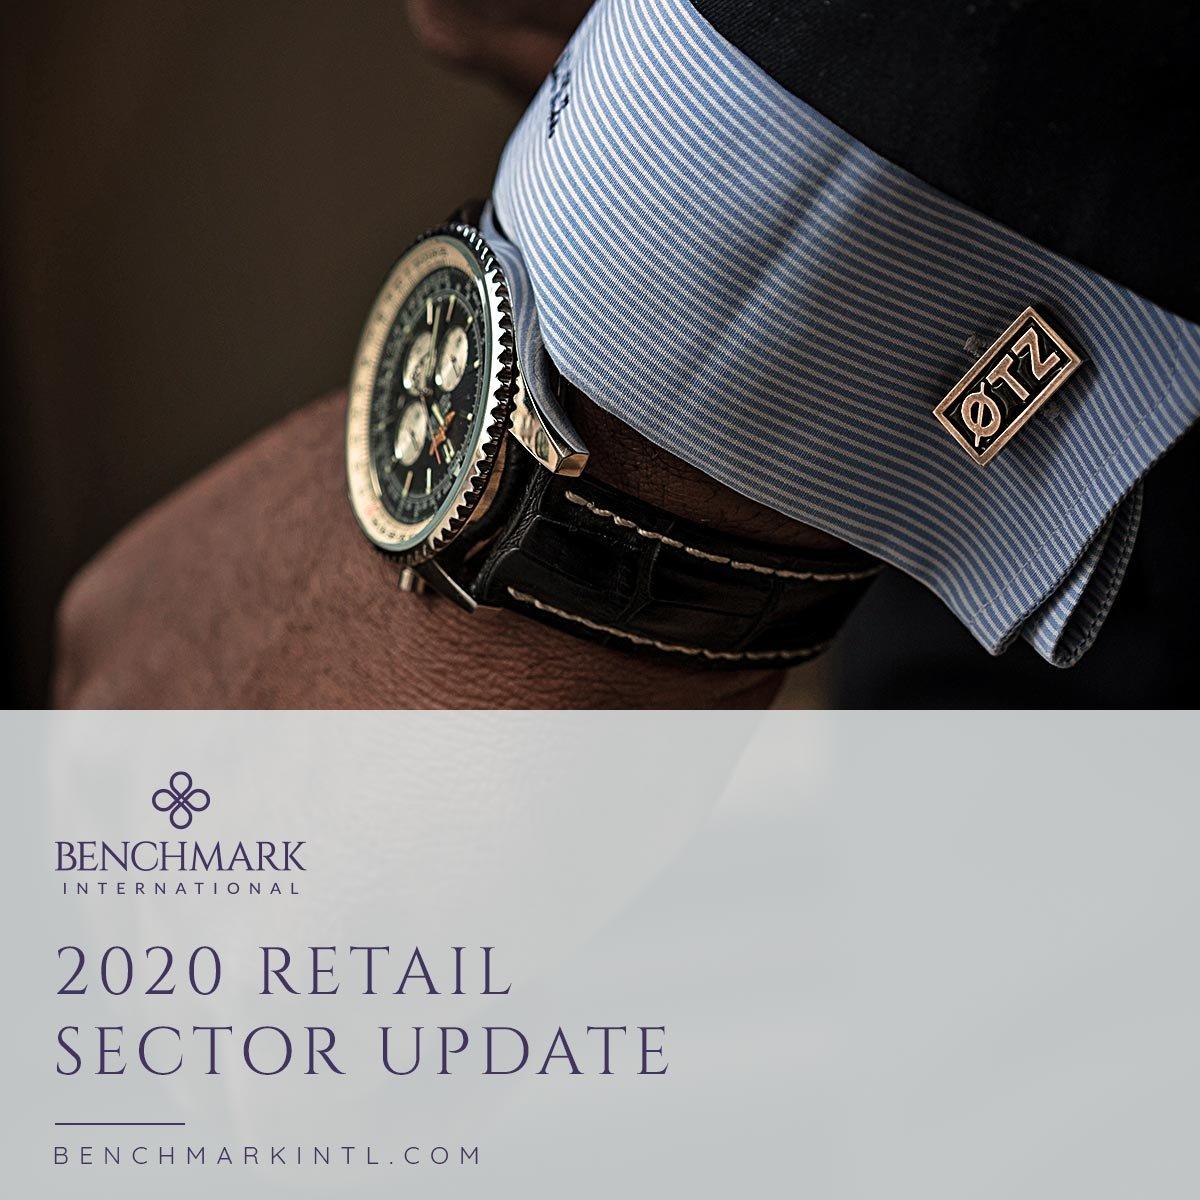 2020_Retail_Sector_Update_Social